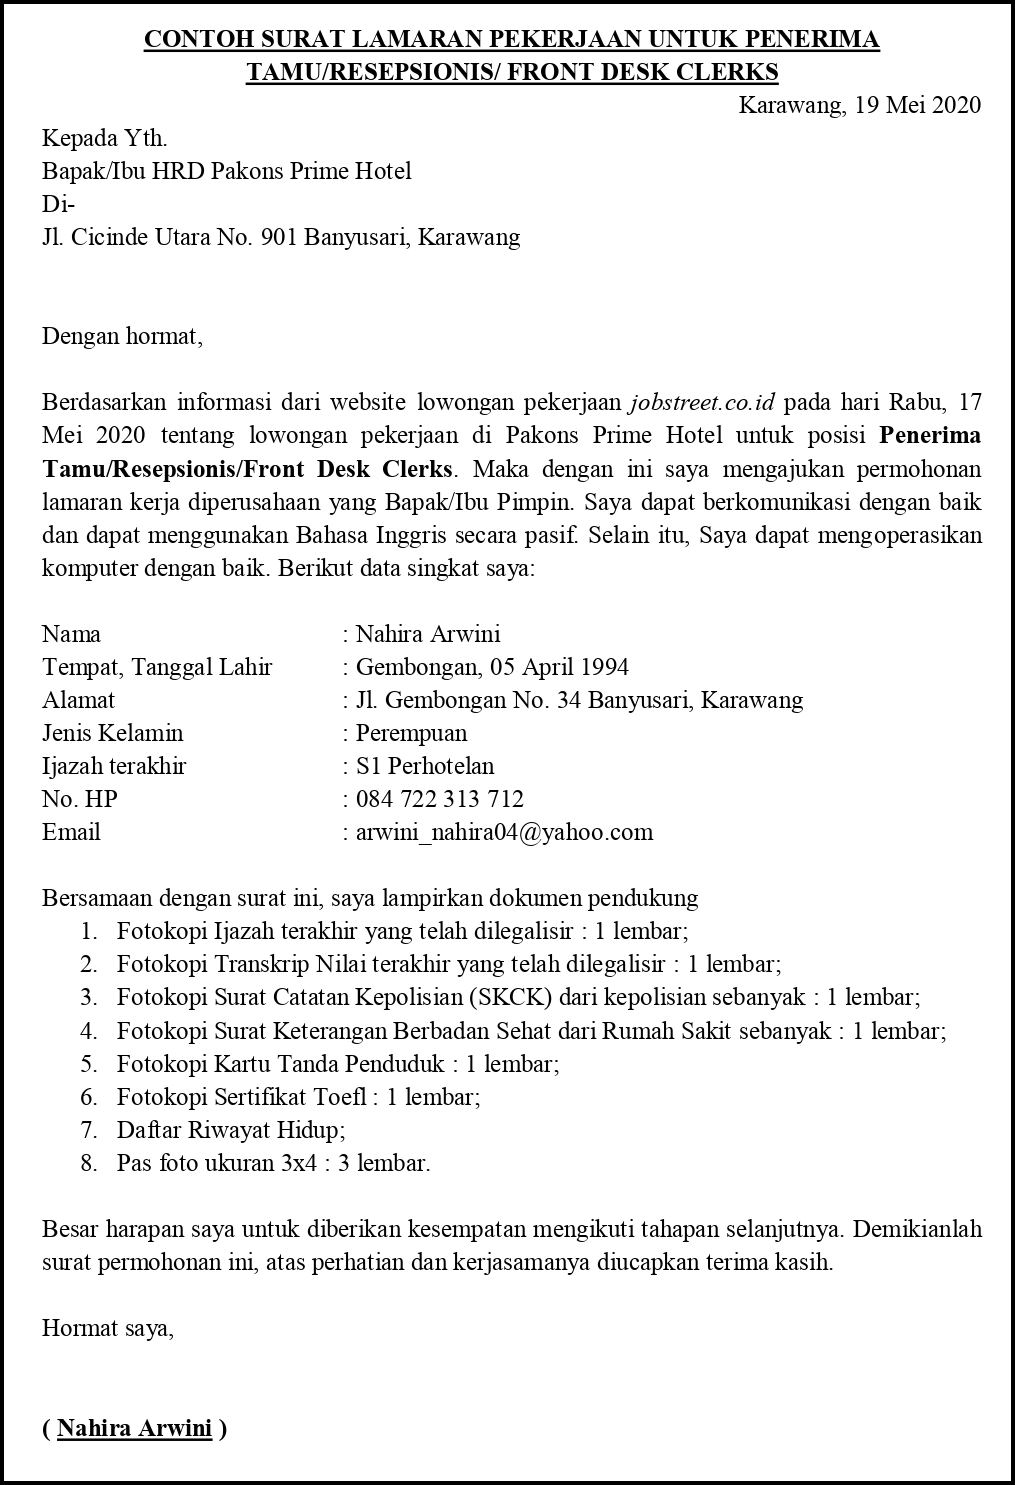 Contoh Surat Lamaran Pekerjaan Untuk Perhotelan Bagian Pelayanan Tamu Tanpakoma